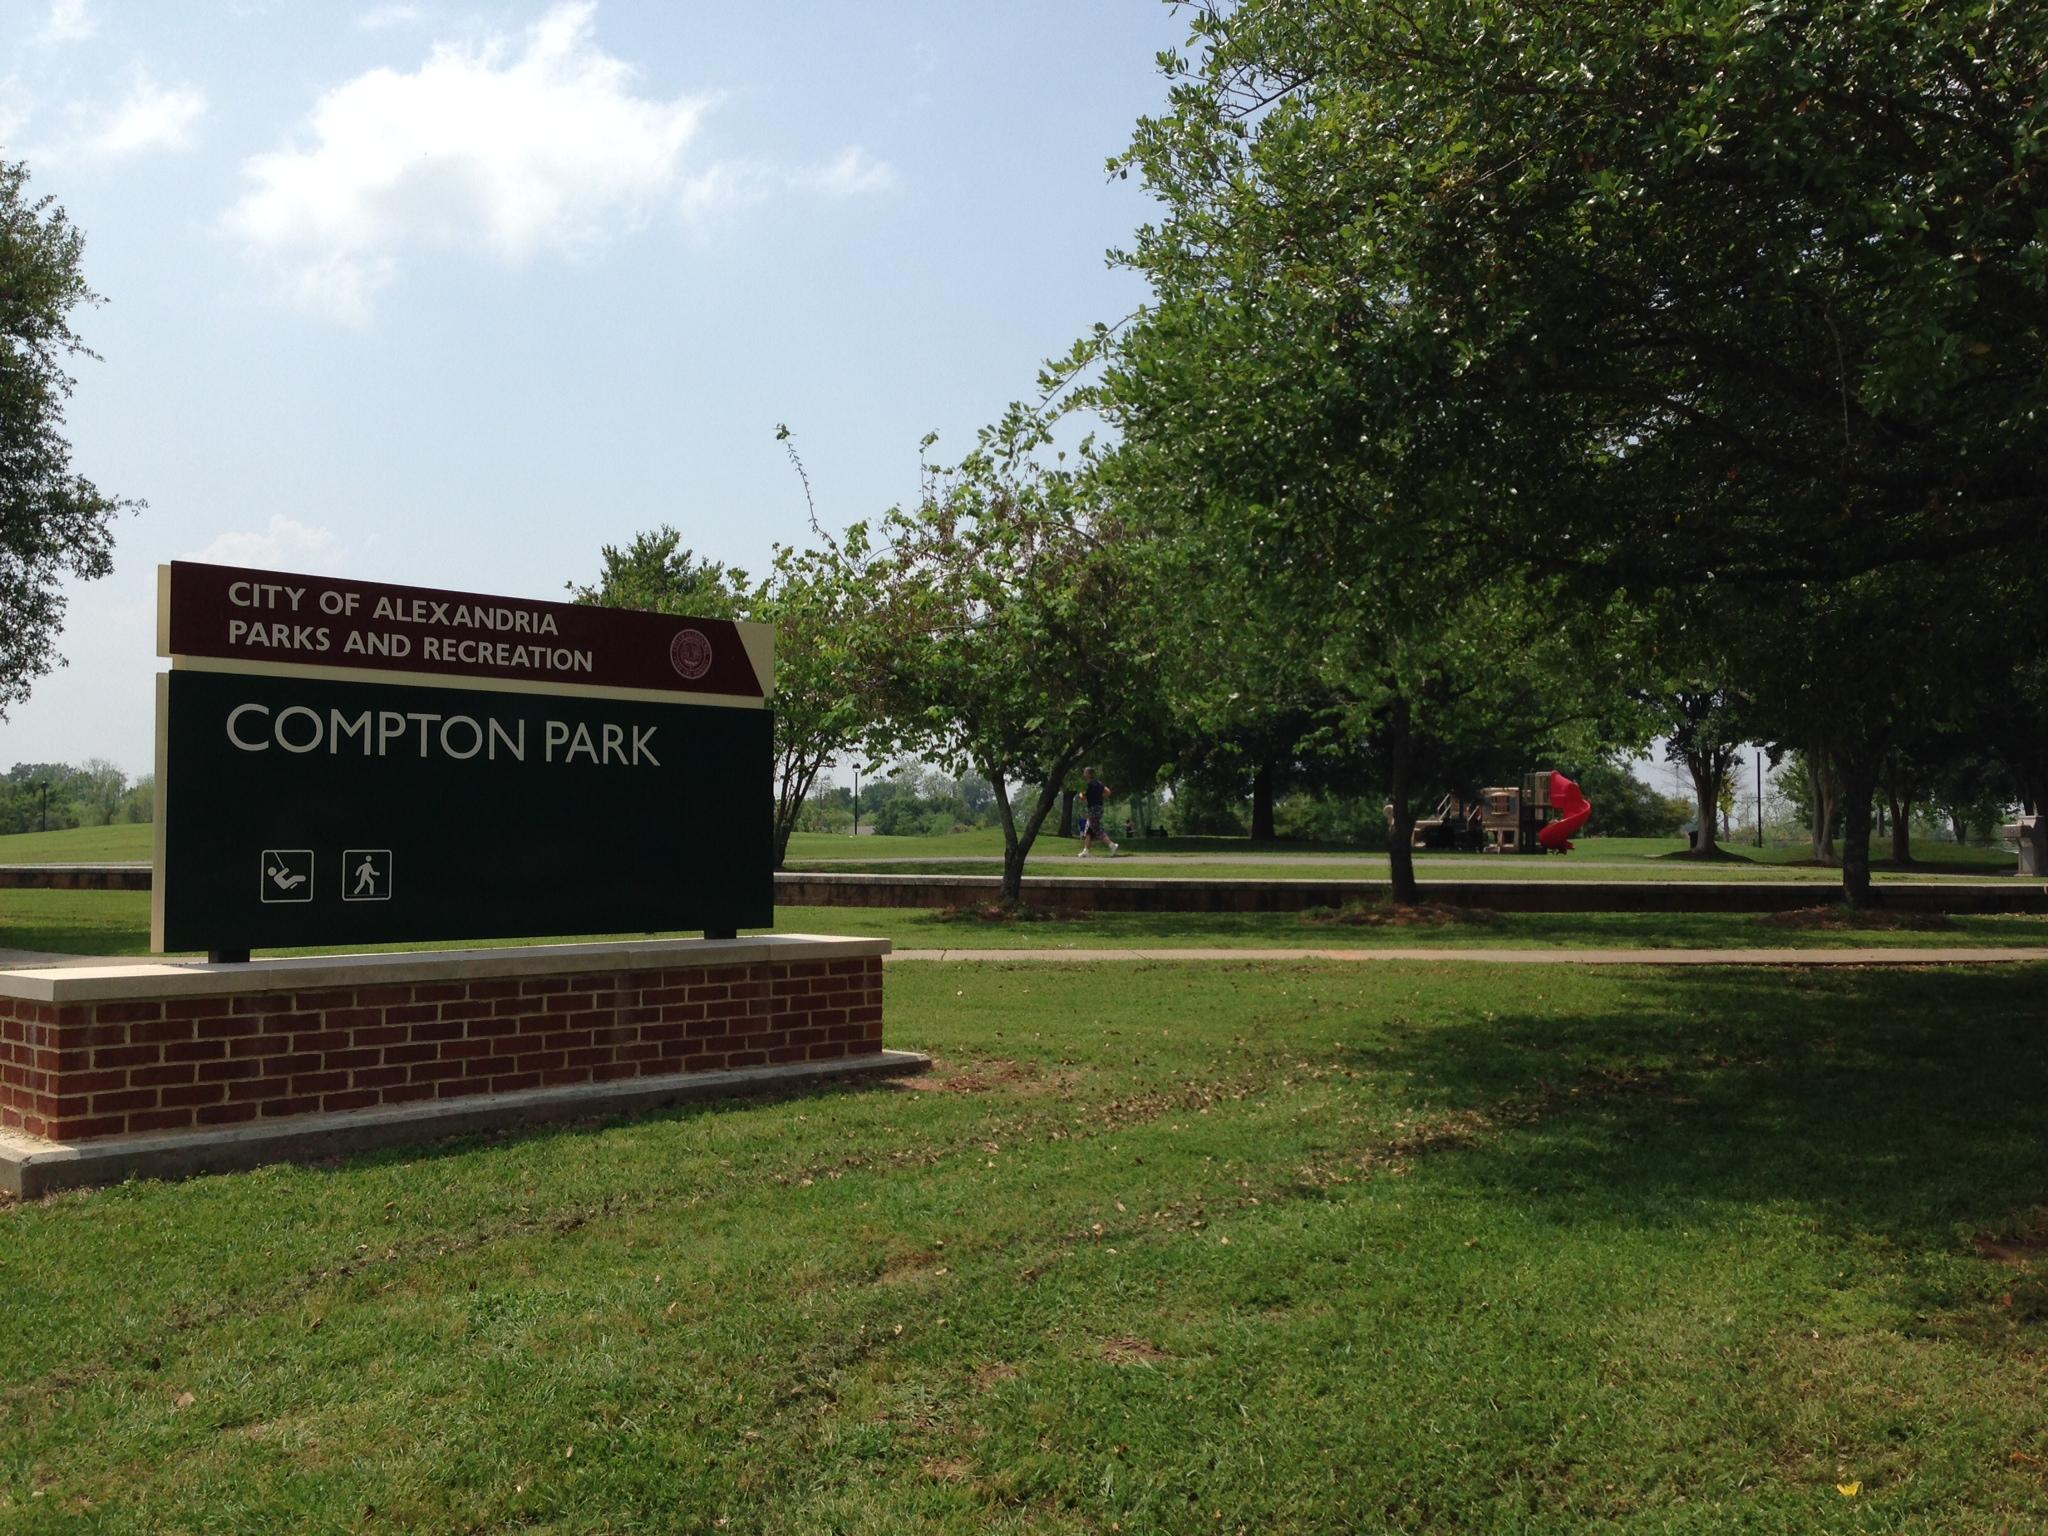 Compton Park Trail